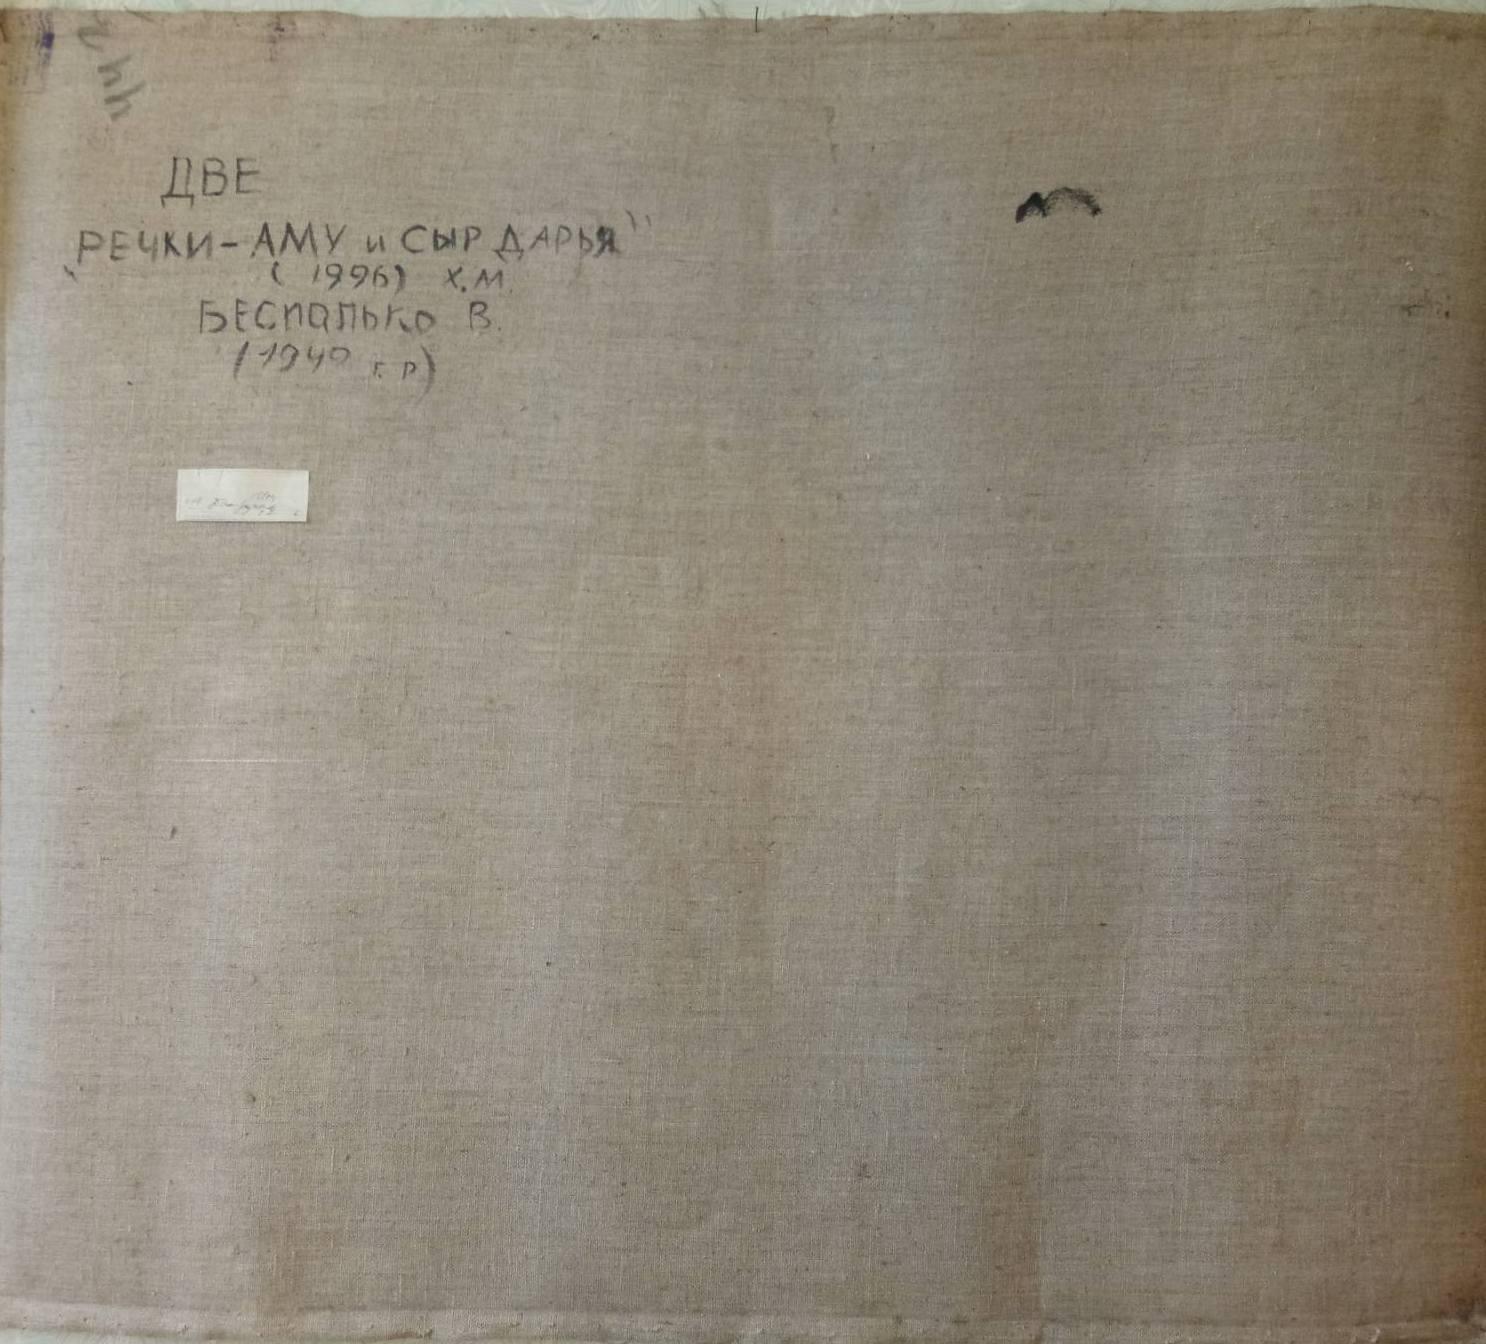 Две речки АМУ и СЫРДАРЬЯ 113-96 см., холст, масло 1996 год  - 1